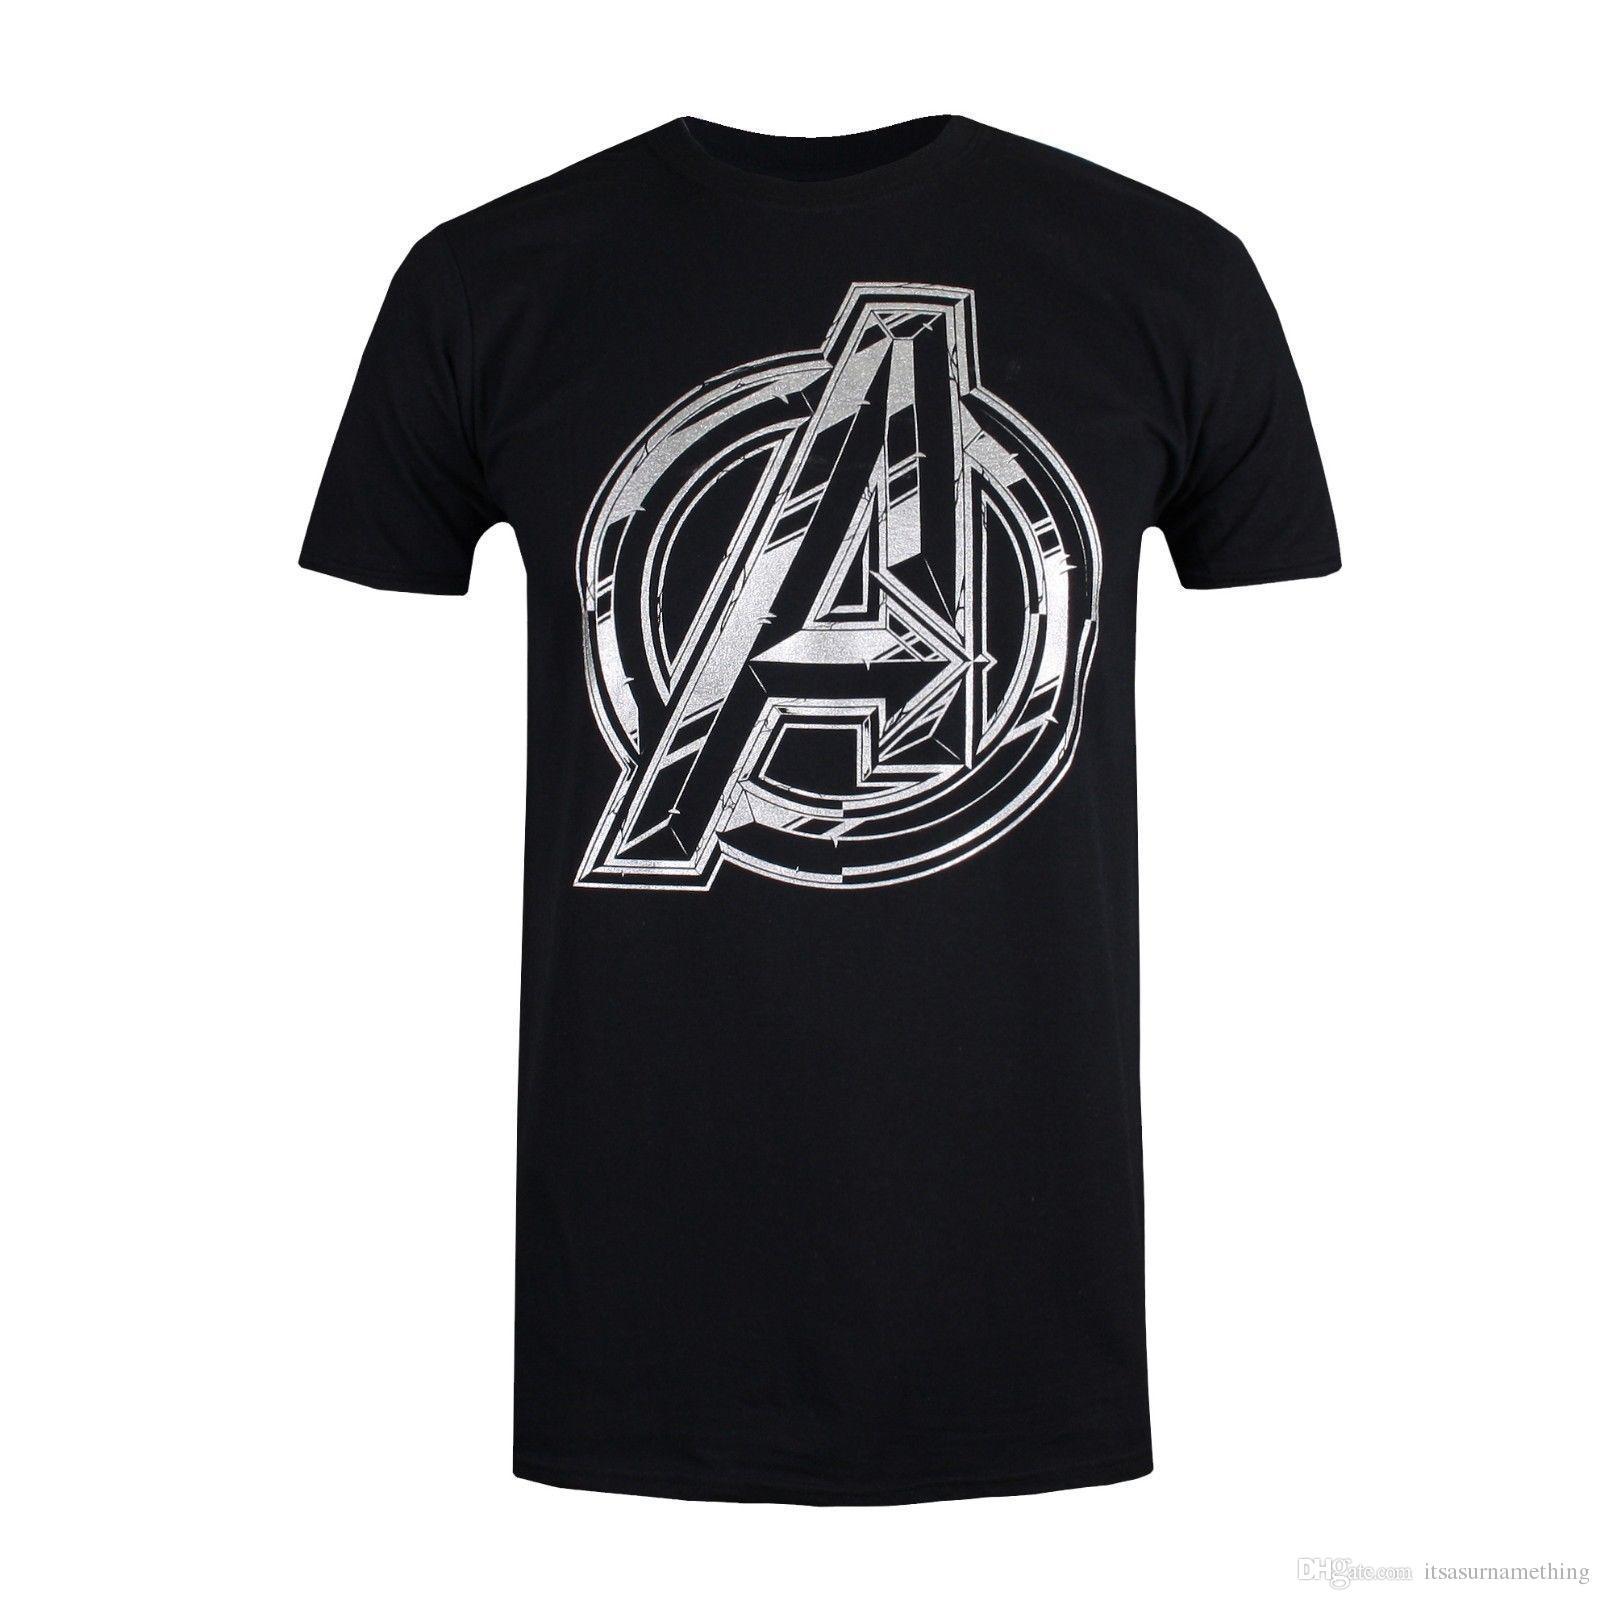 5f1505edd6f Compre Logotipo De Marvel Avengers Infinity War Camiseta Para Hombre Negro  O Blanco Tallas S XXL A $10.06 Del Itsasurnamething | DHgate.Com